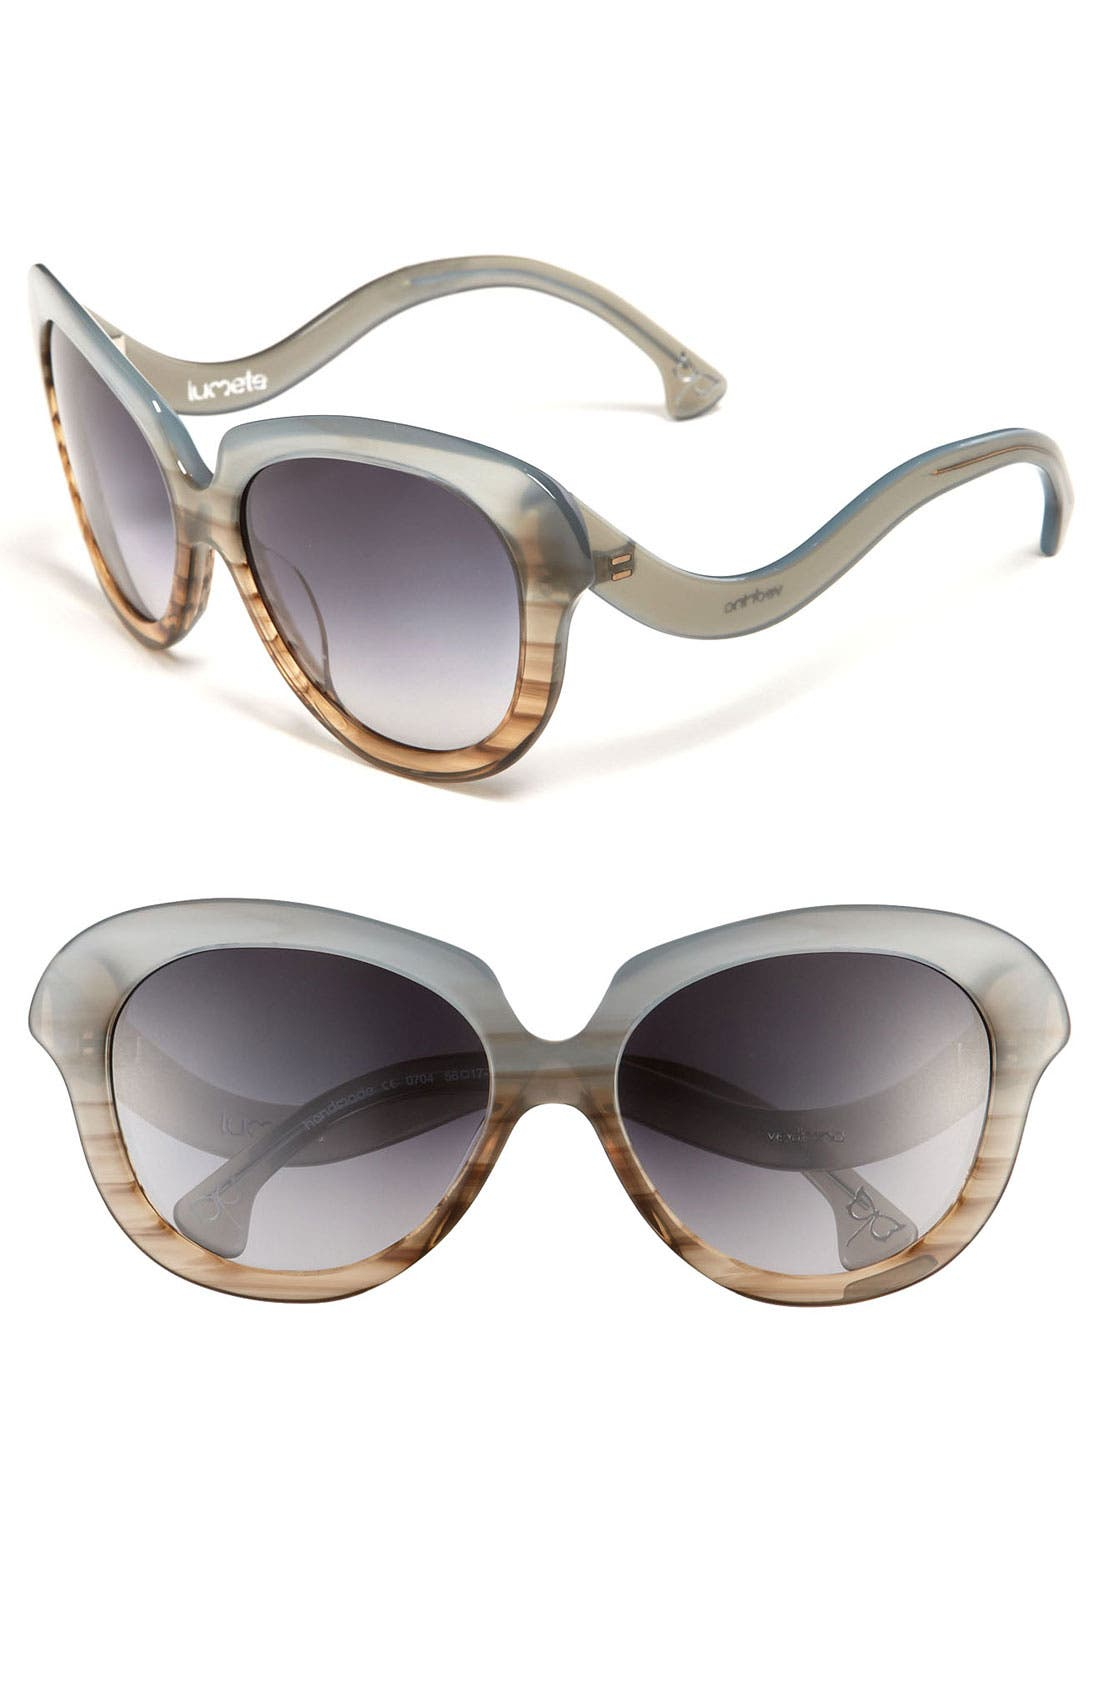 Main Image - Lumete Eyewear 'Vedrina' Sunglasses